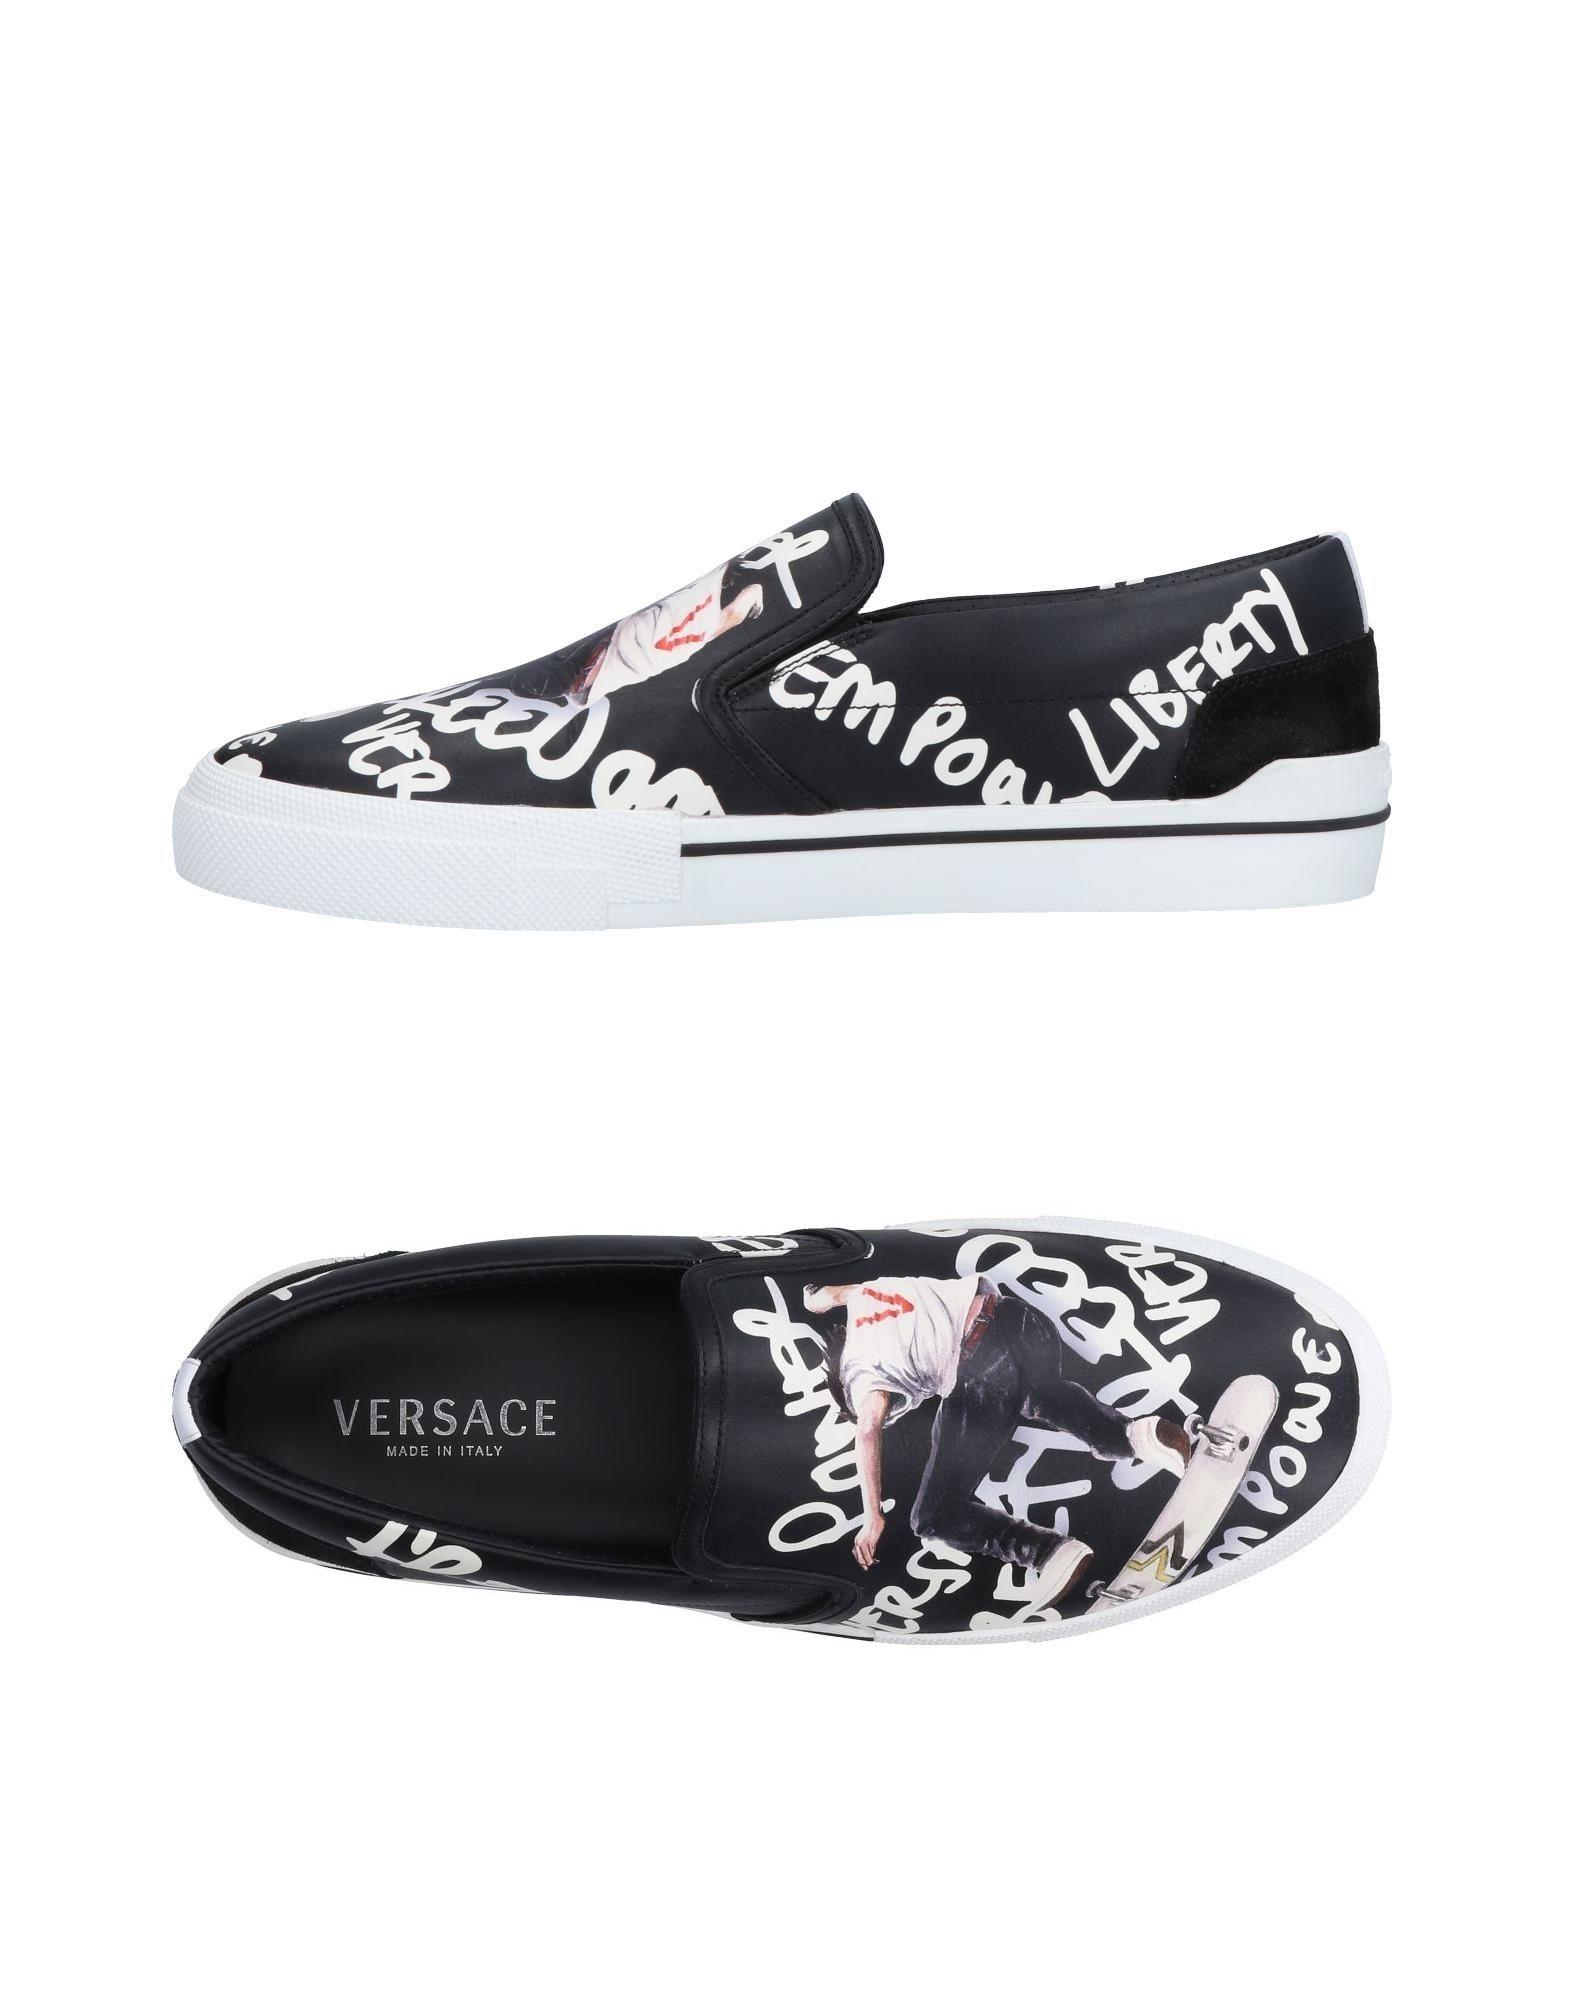 Sneakers Versace Homme - Sneakers Versace  Noir Super rabais